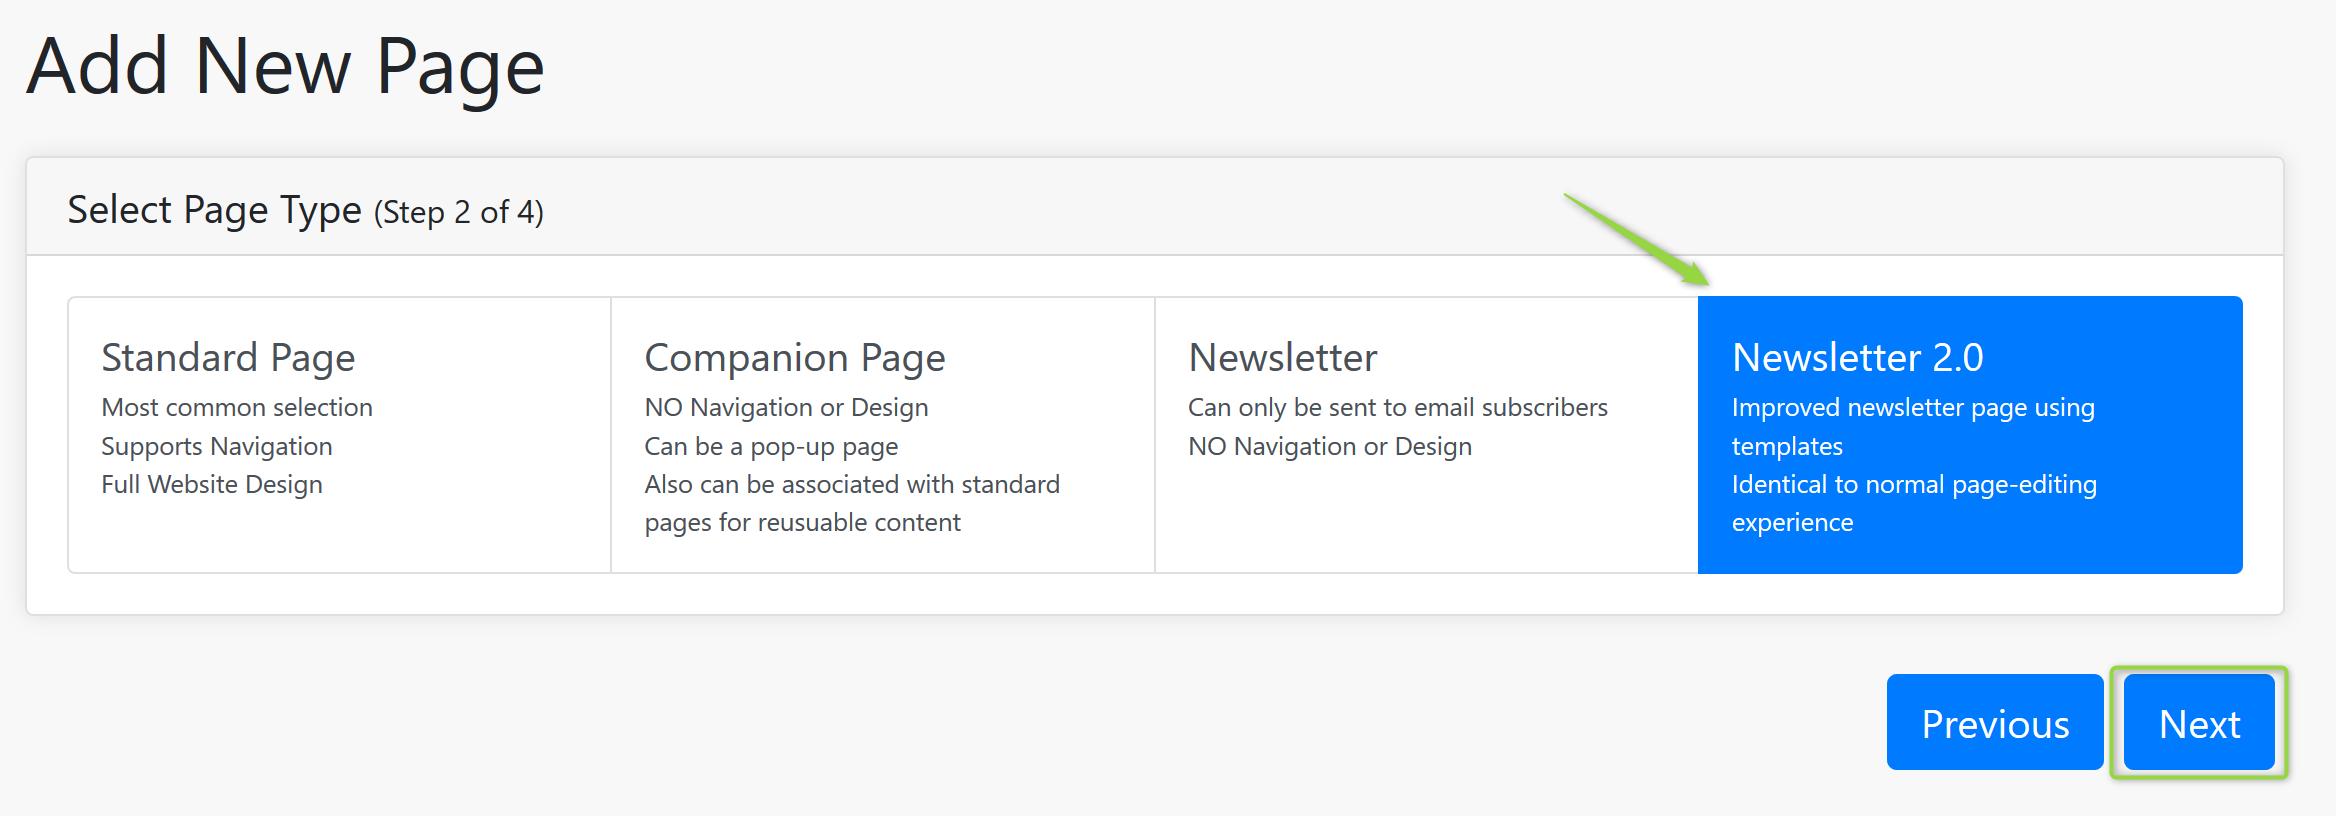 Add New Page Screenshot